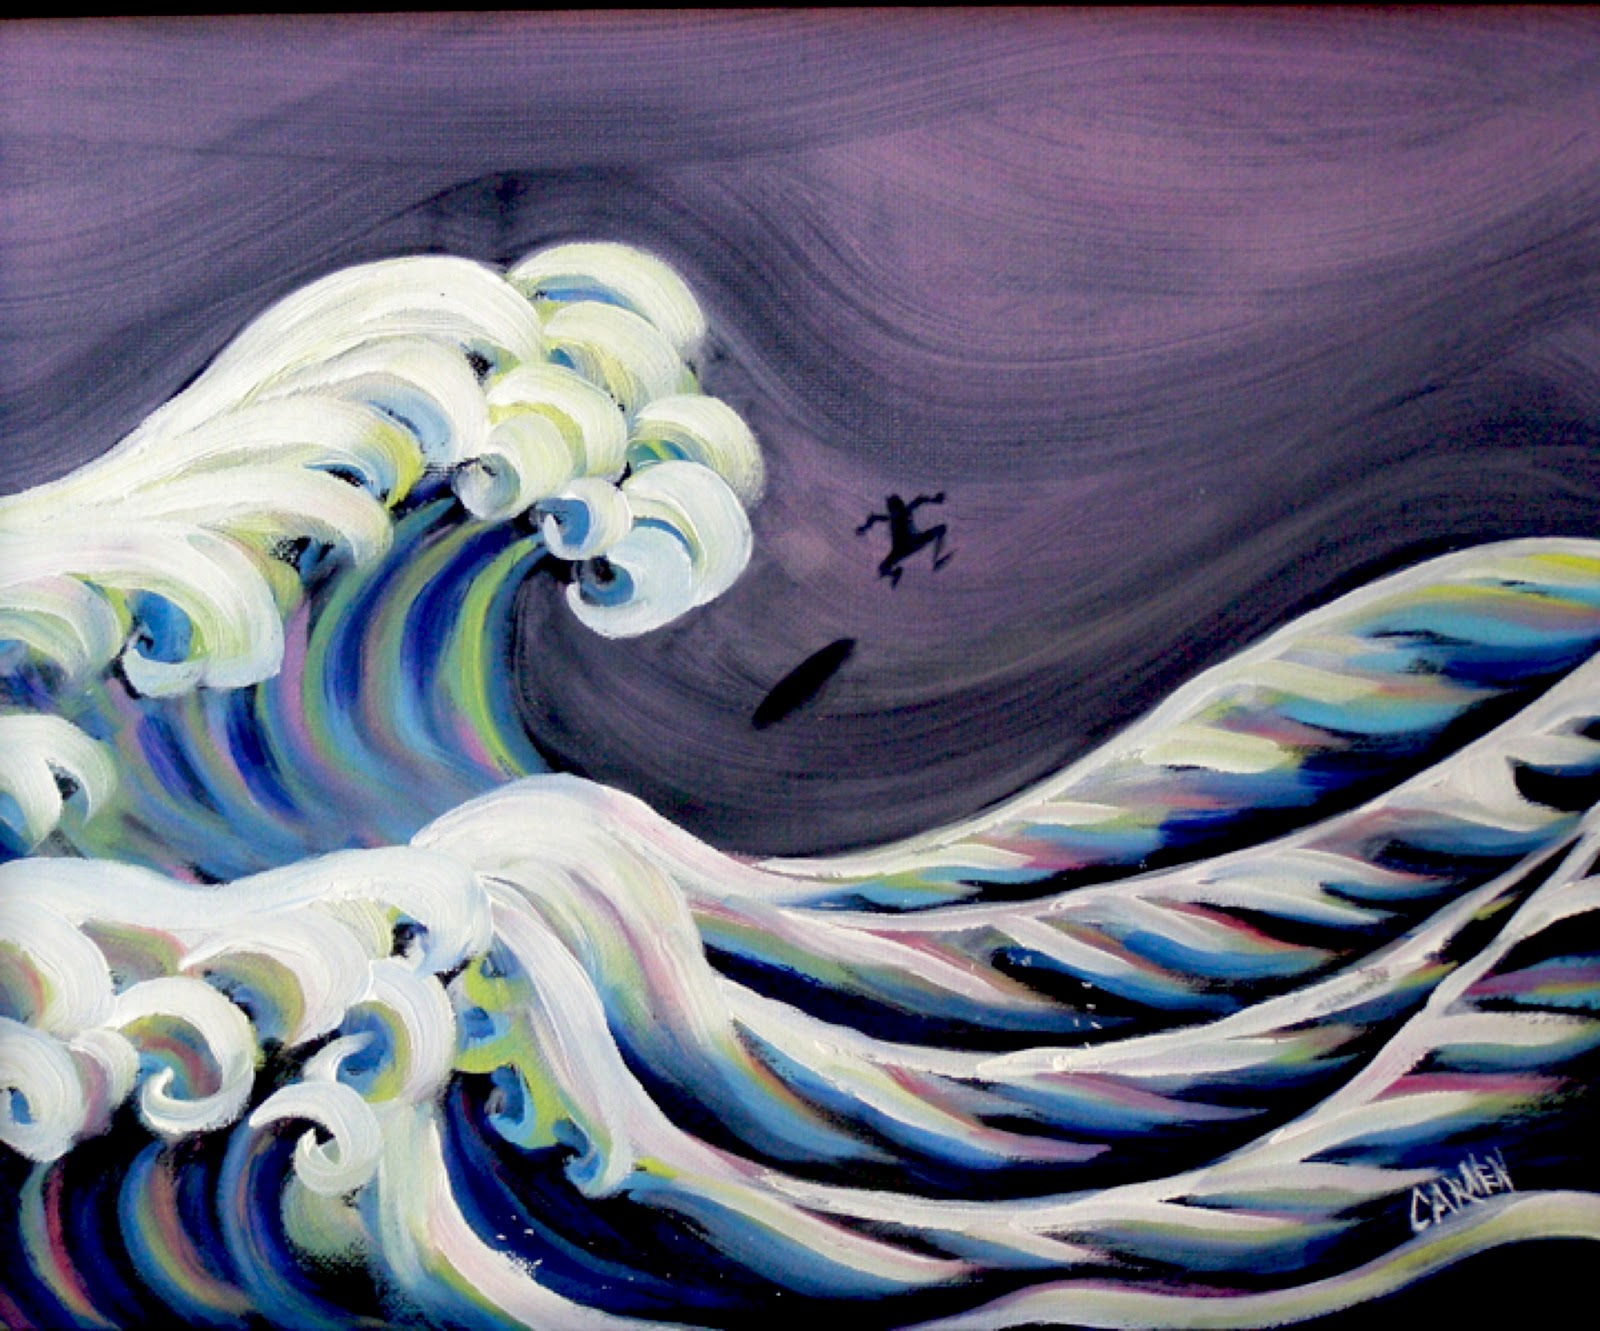 """Homage to Hokusai, 8x10 Oil on Canvas Board"" original fine art by Carmen Beecher"